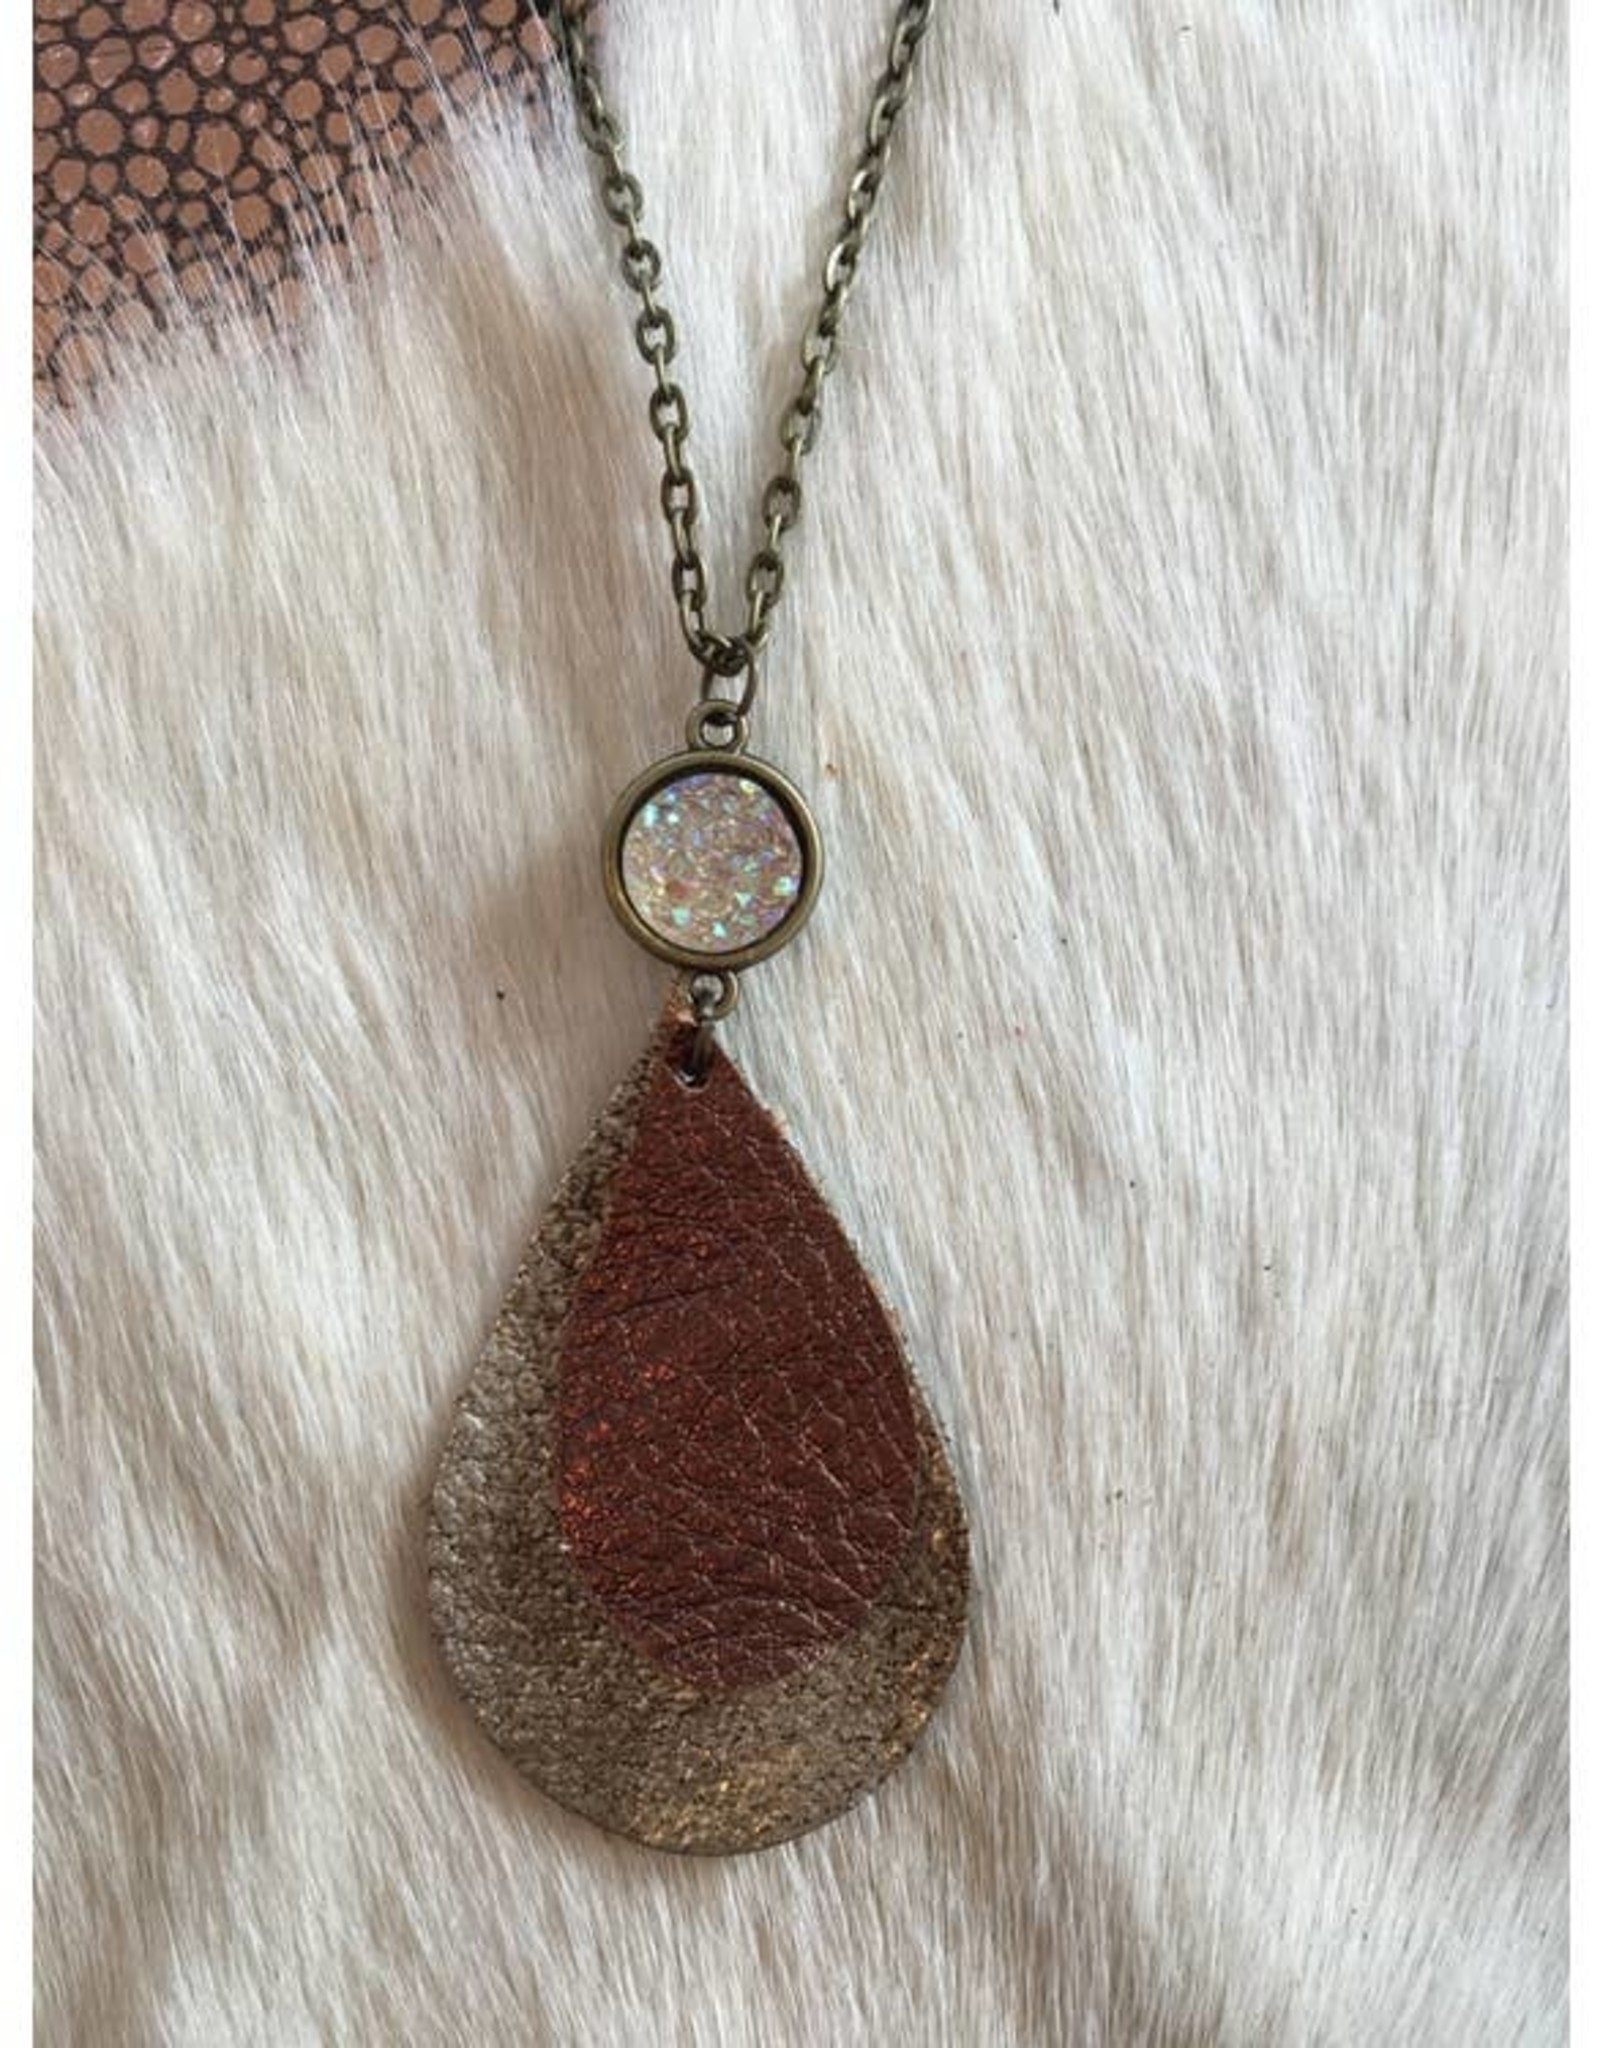 Mod Miss Bronze on Brown Sugar Teardrop Leather Necklace